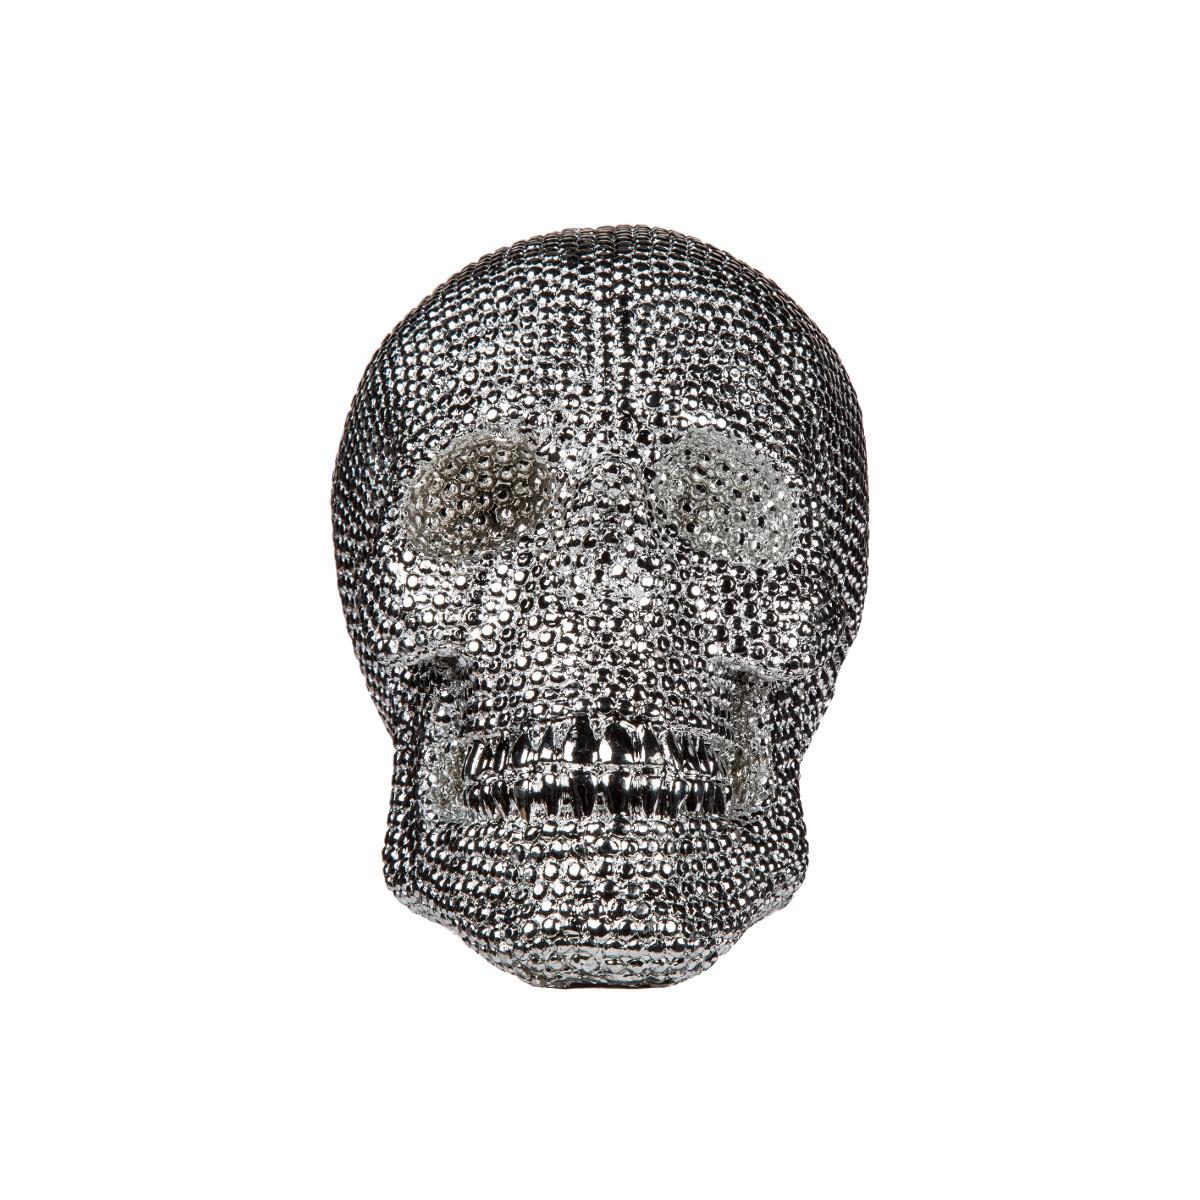 decorational skull - glimmering silver